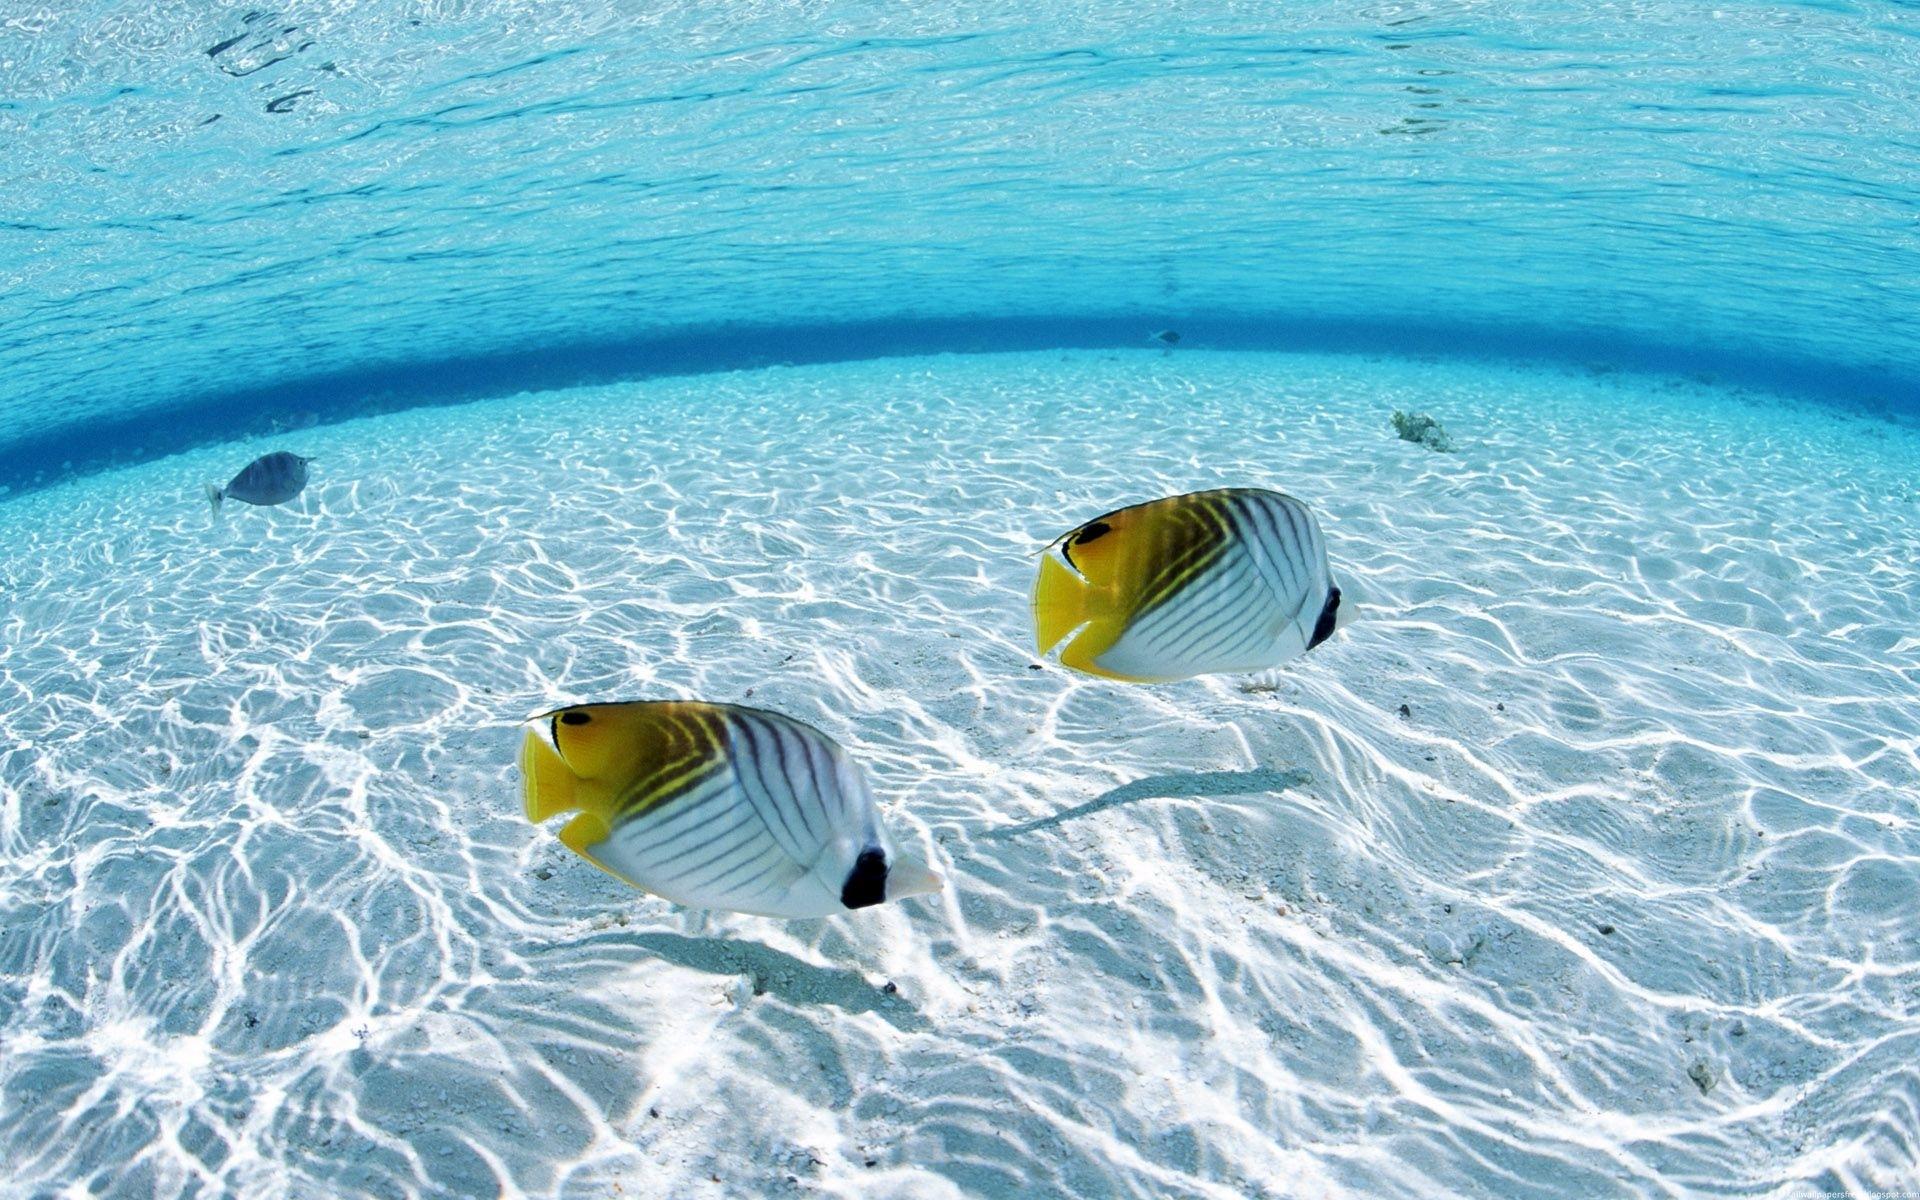 underwater on the sea | fish